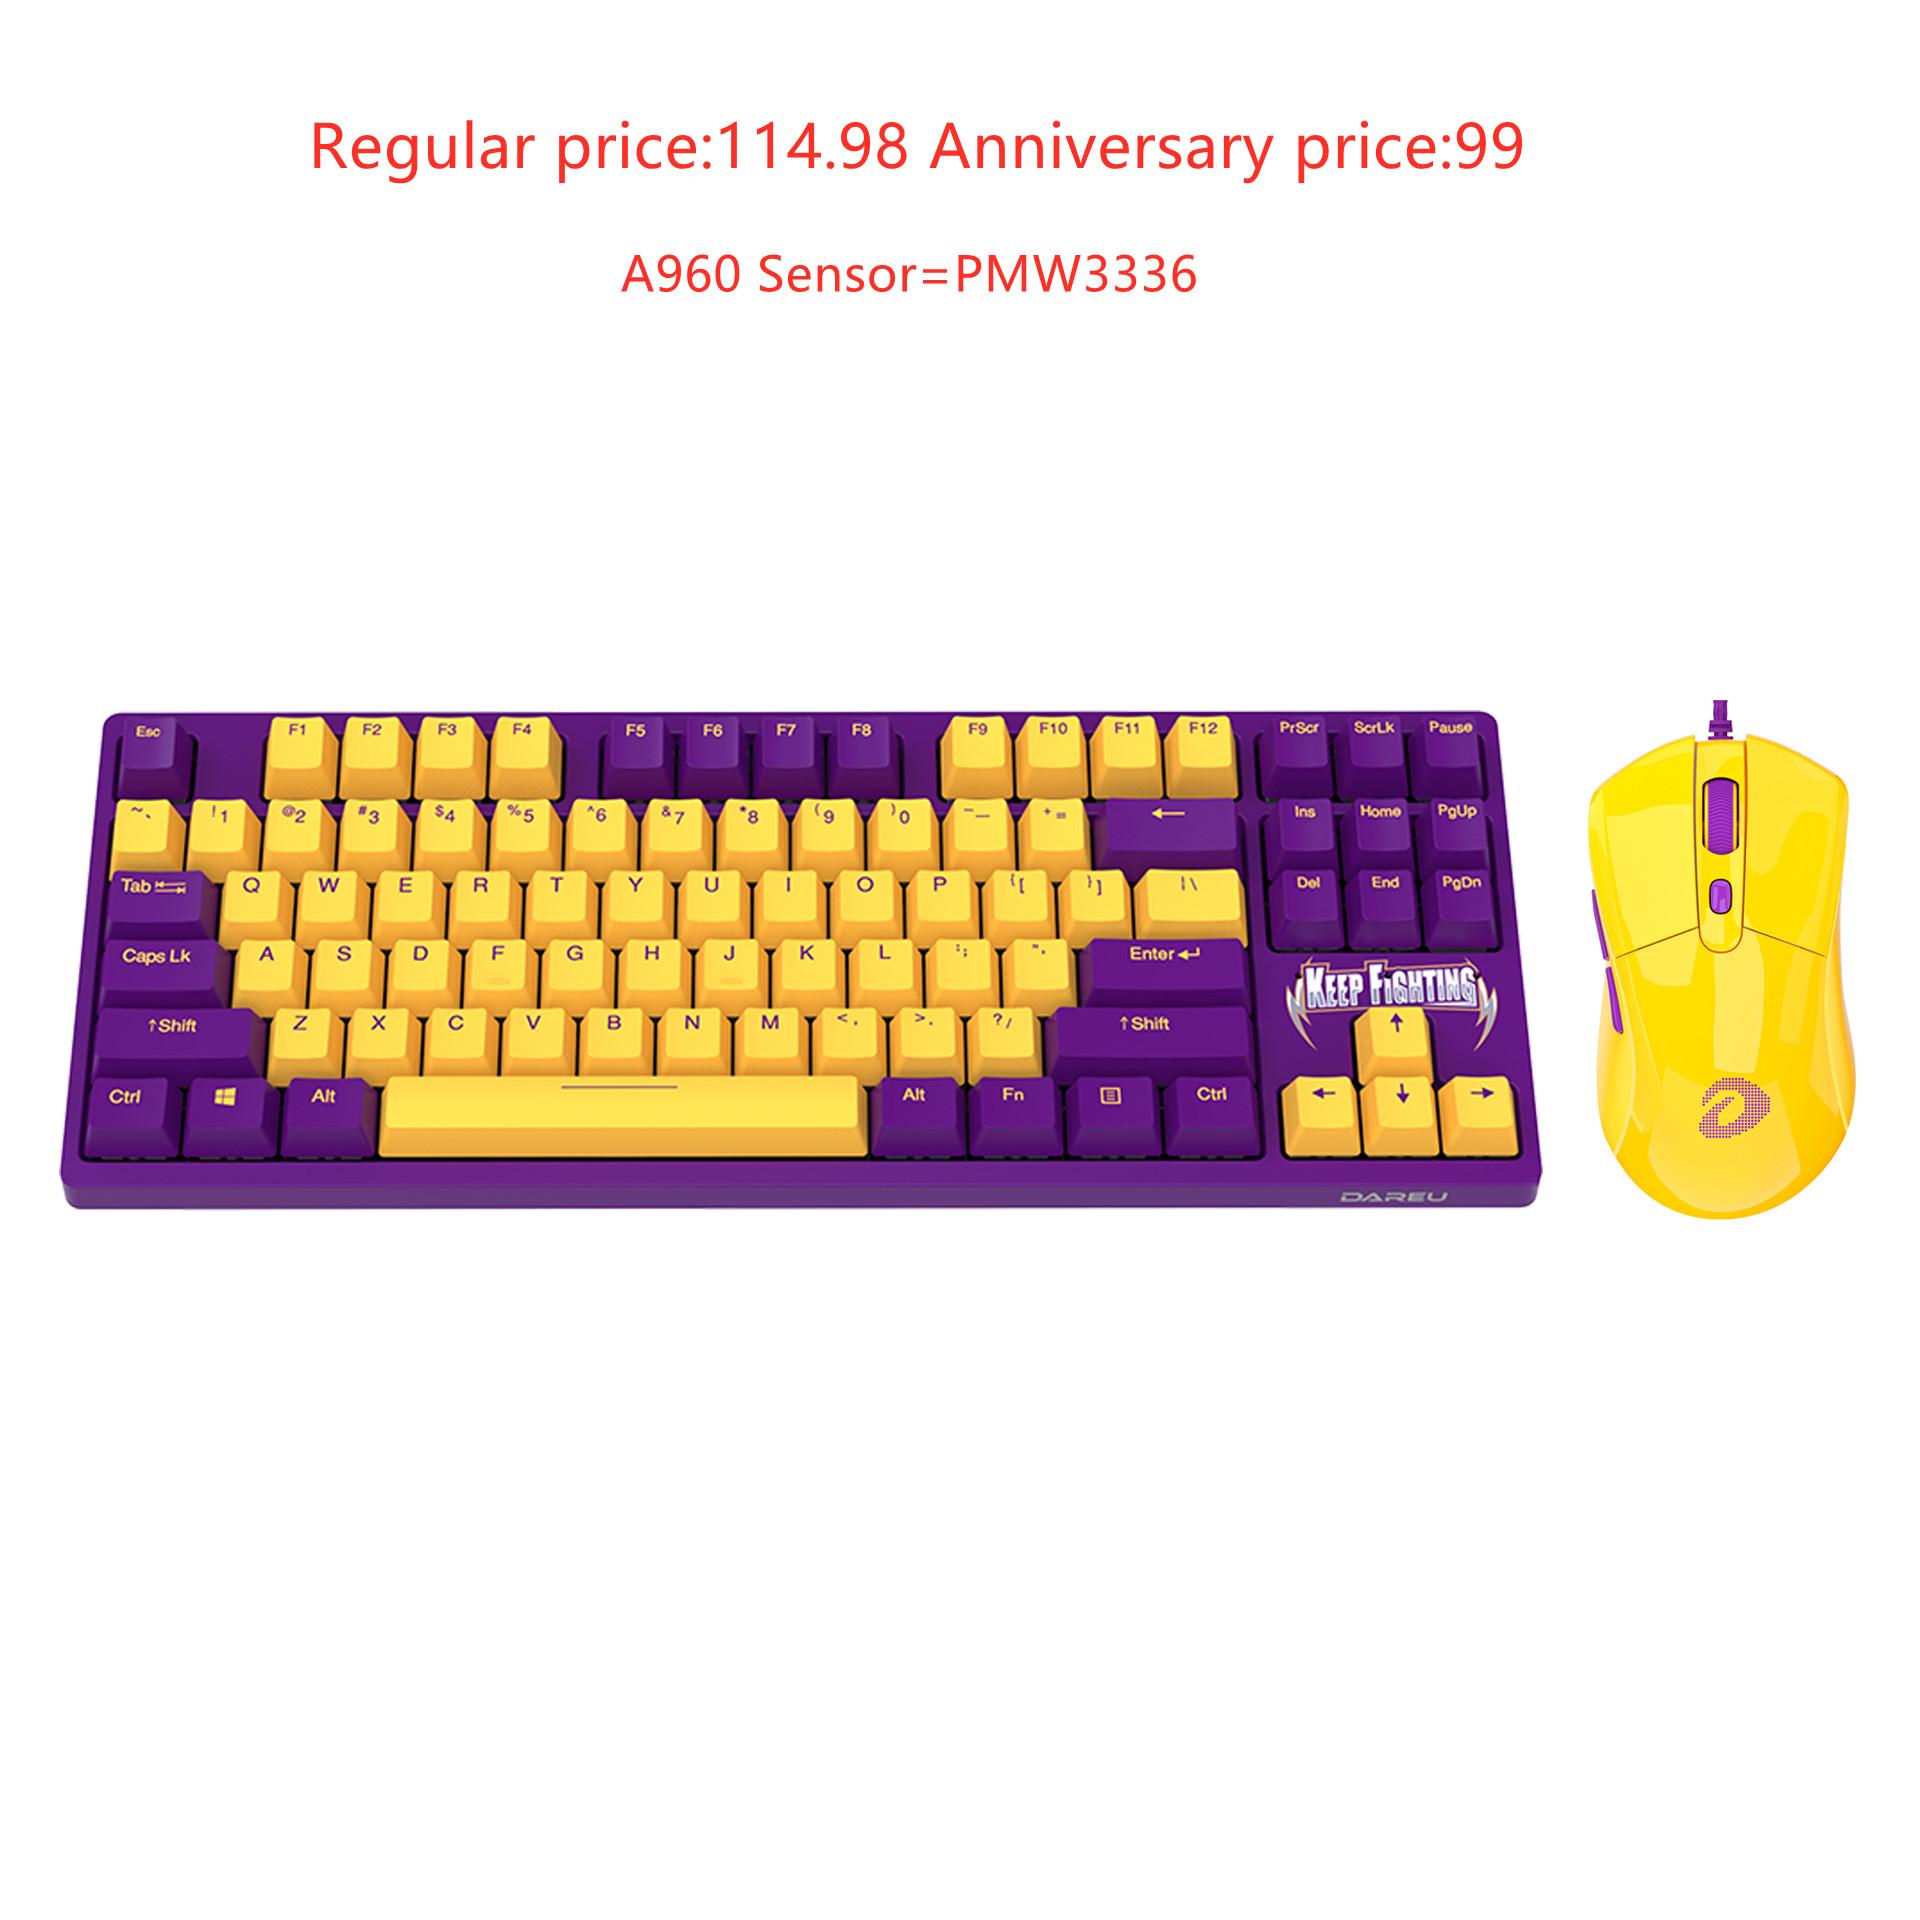 Dareu A87 KB+Dareu A960 Keyboard&mouse Combo